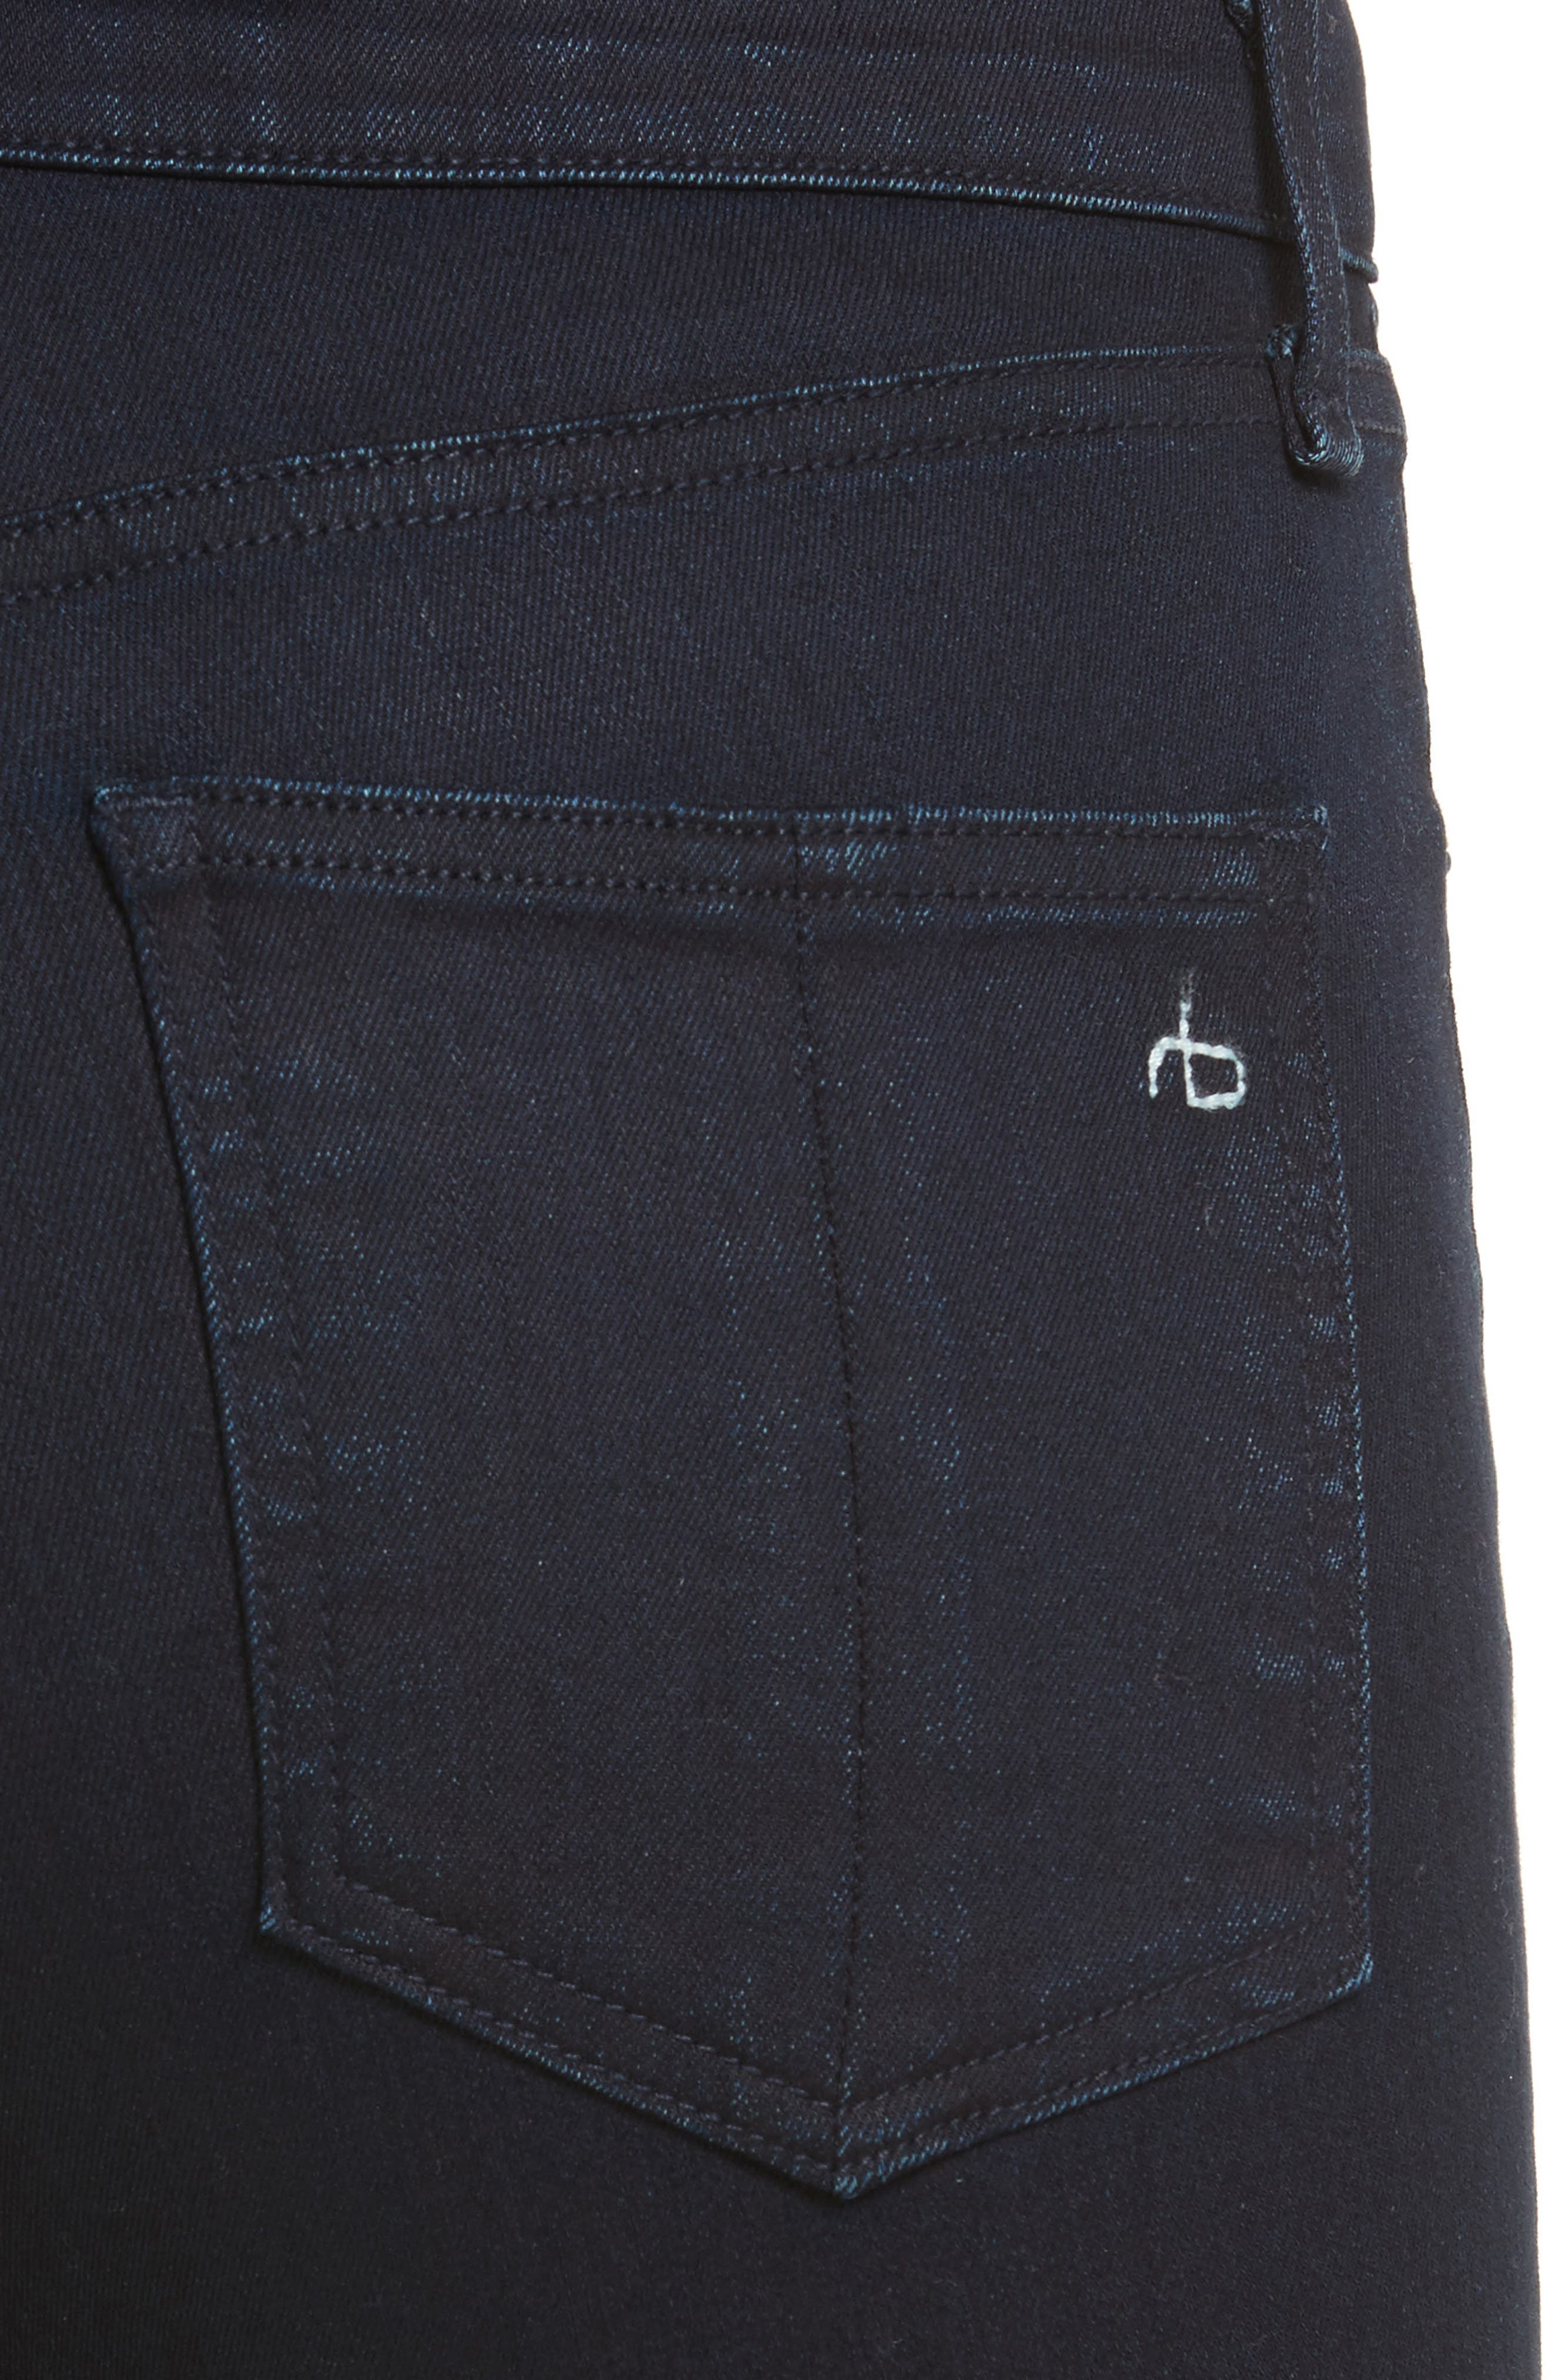 RAG & BONE,                             JEAN High Waist Ankle Skinny Jeans,                             Alternate thumbnail 4, color,                             001